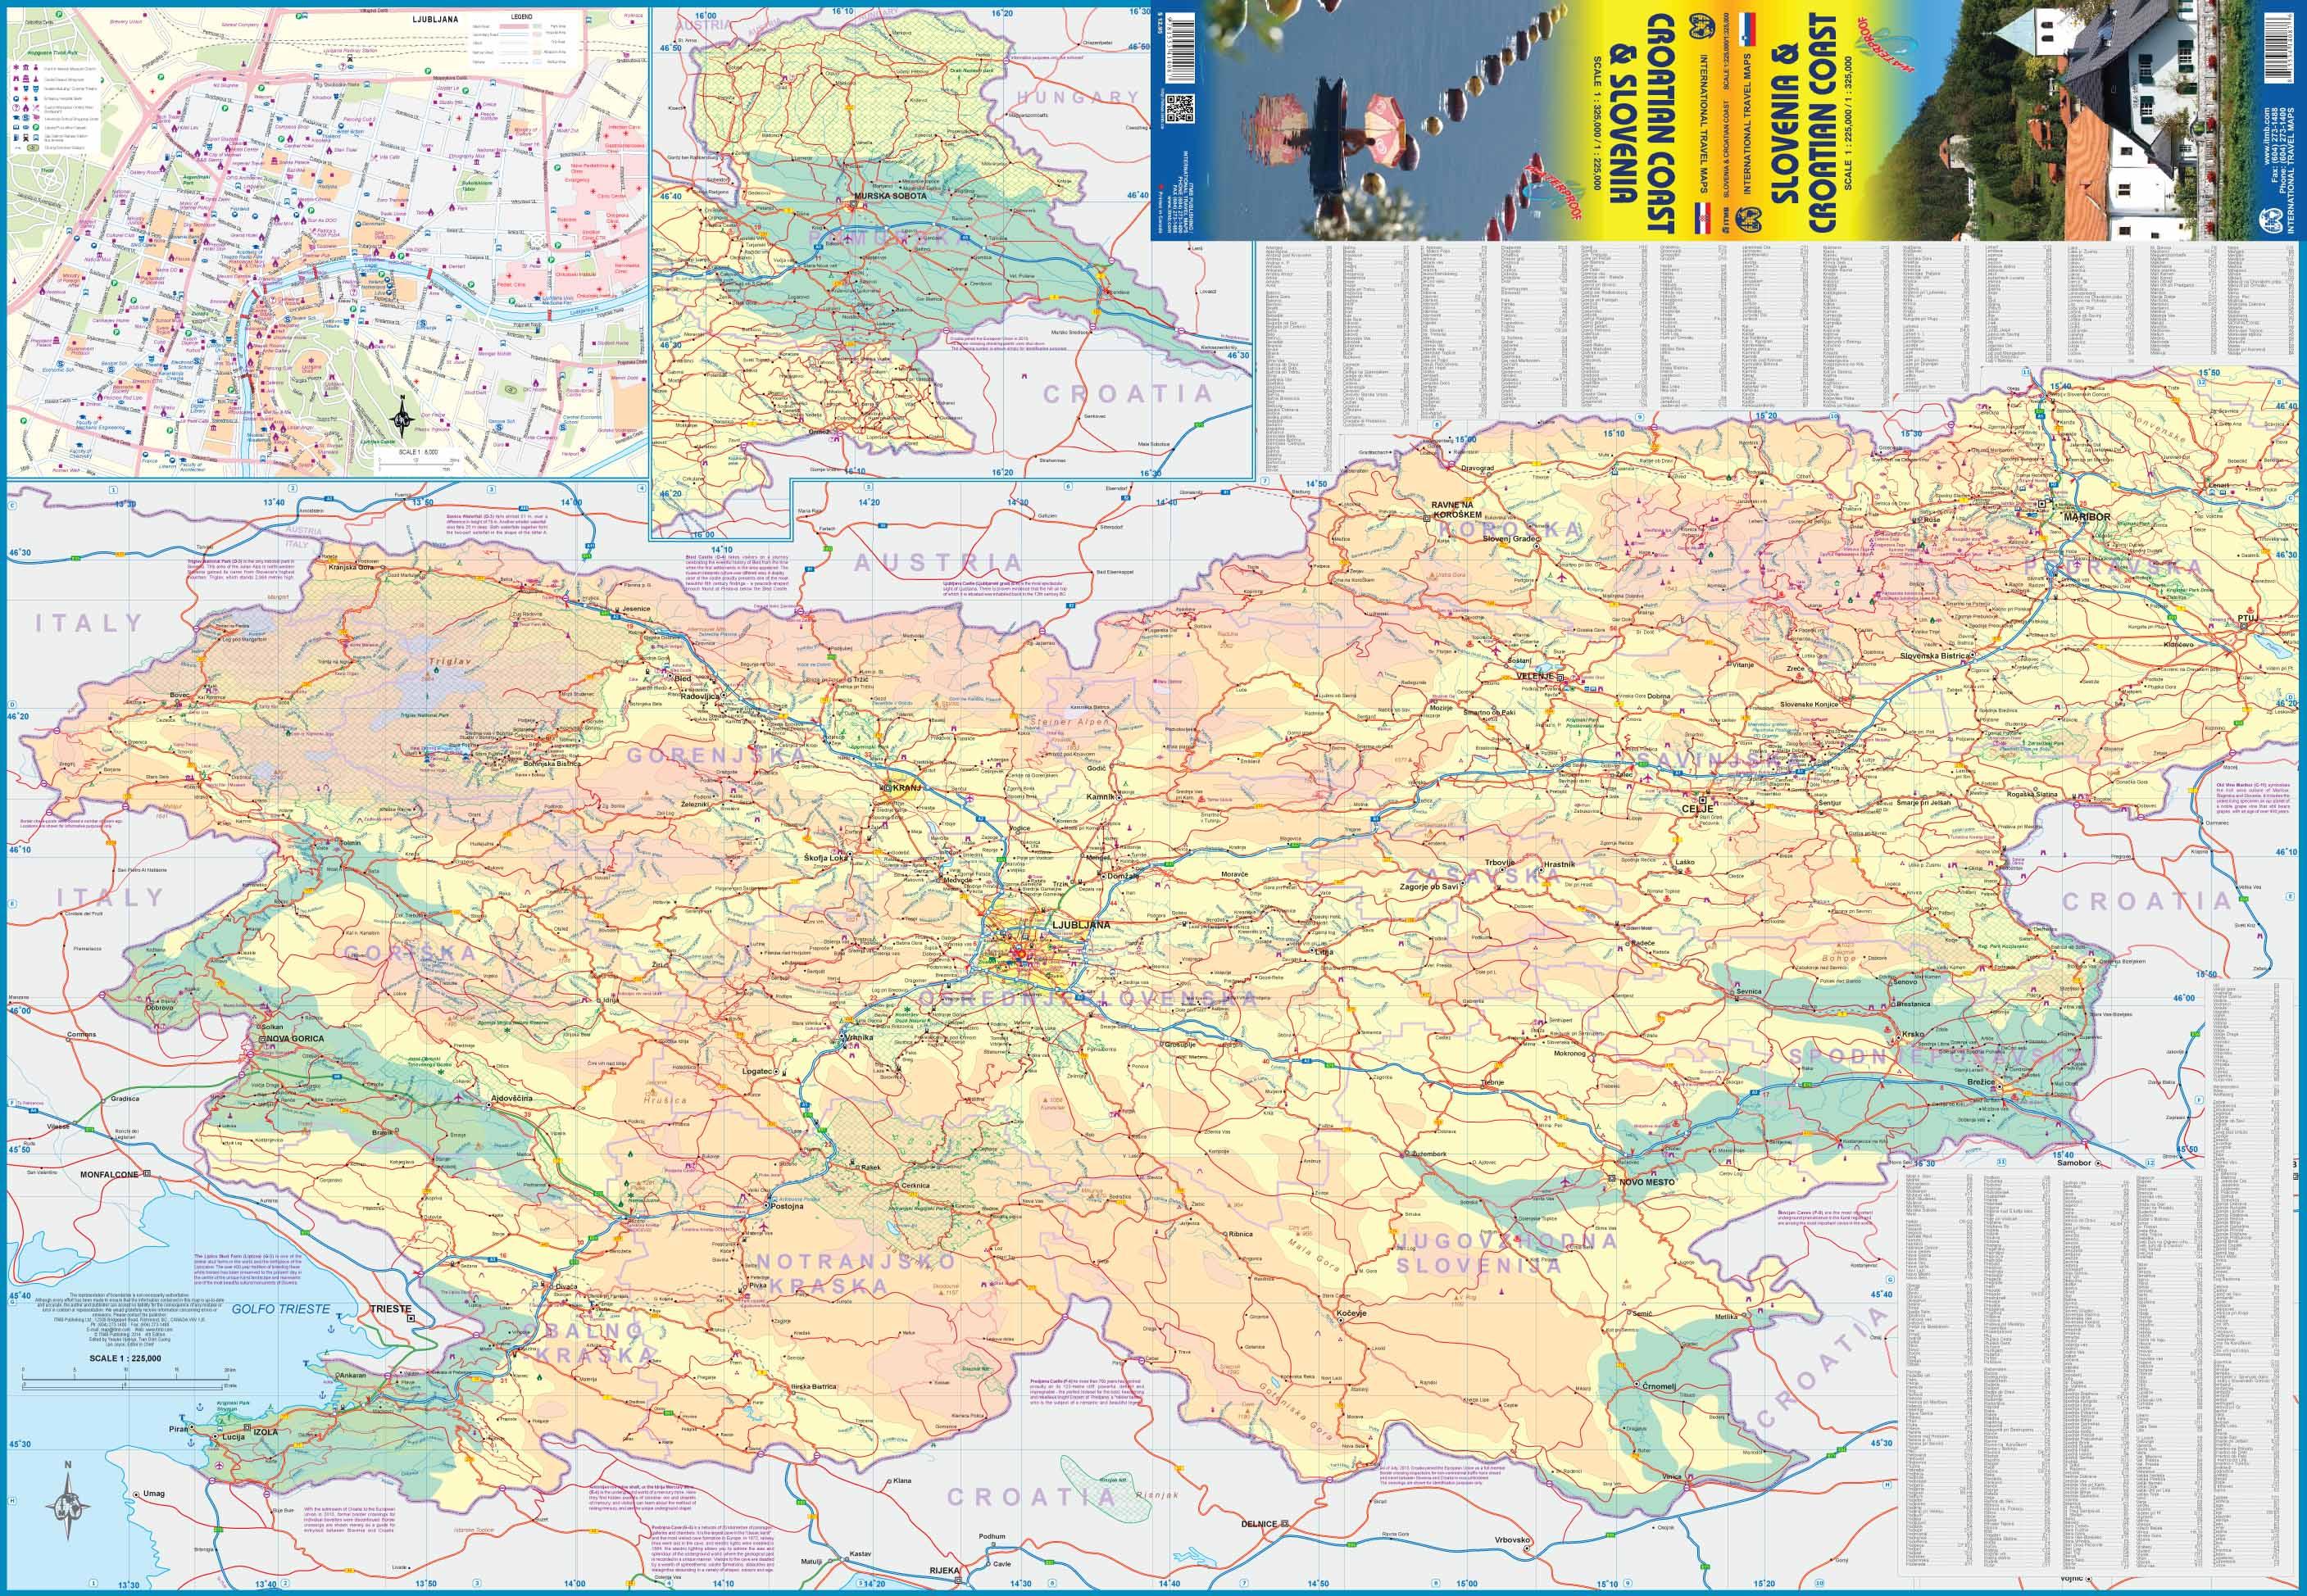 Wegenkaart - landkaart Slovenie - Slovenia & Croatian